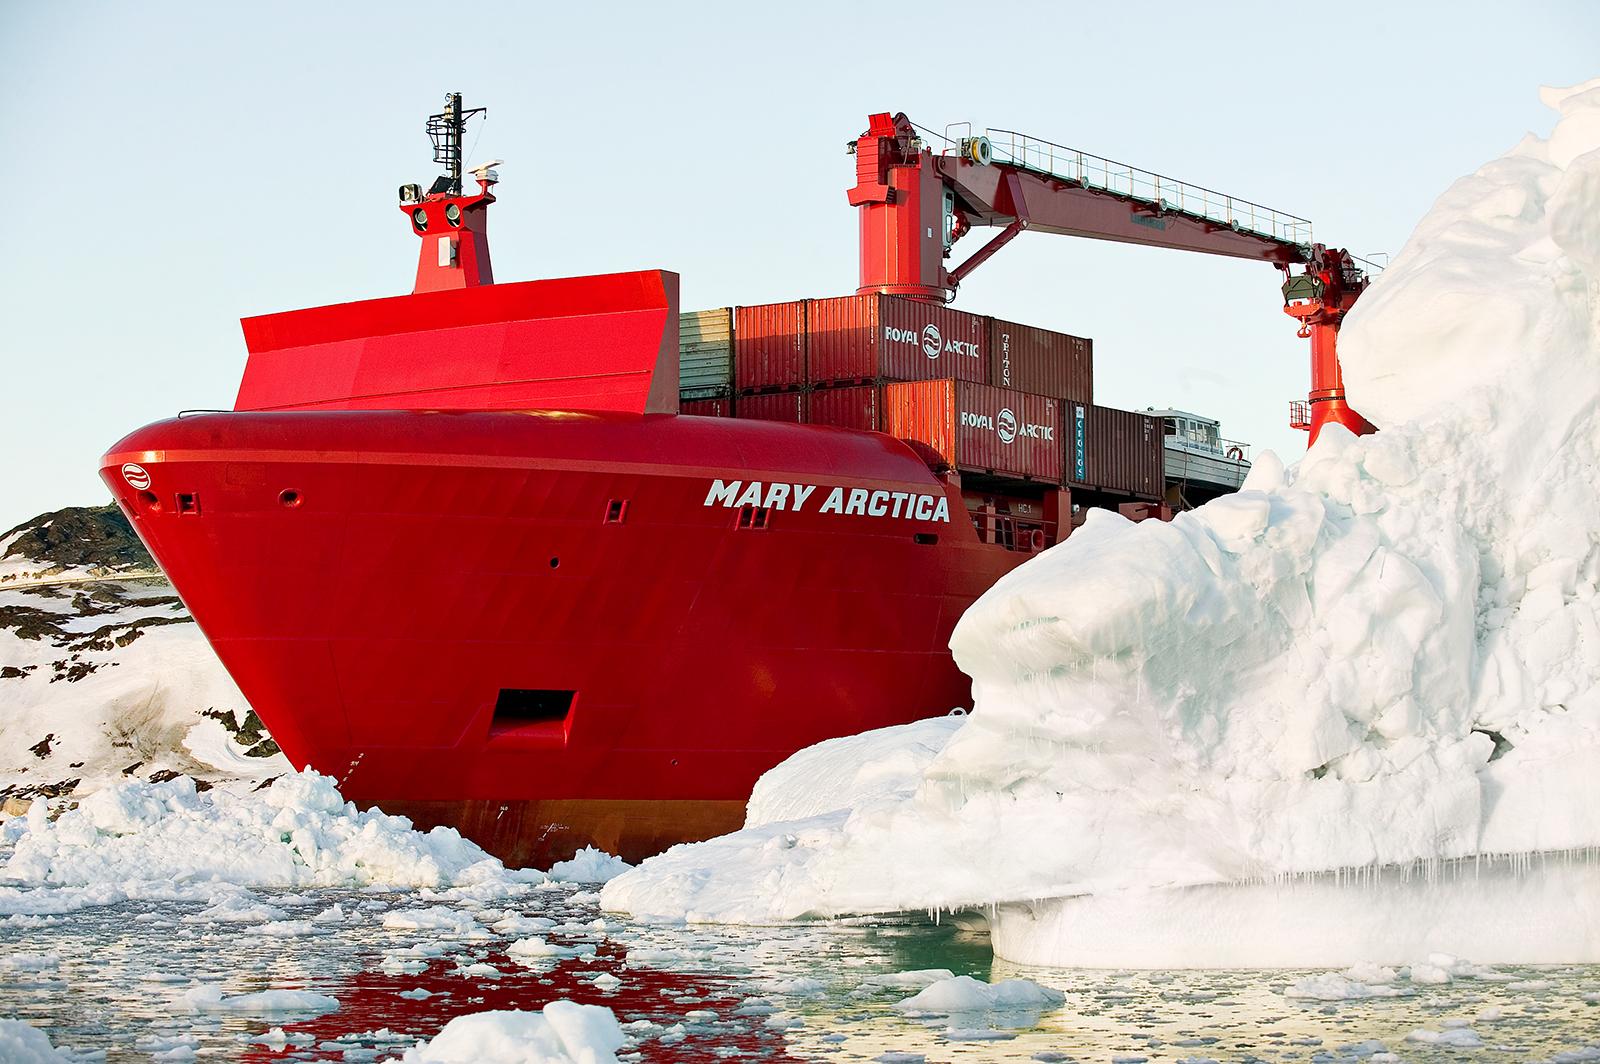 Arctic Line : Mary arctica royal arctic line